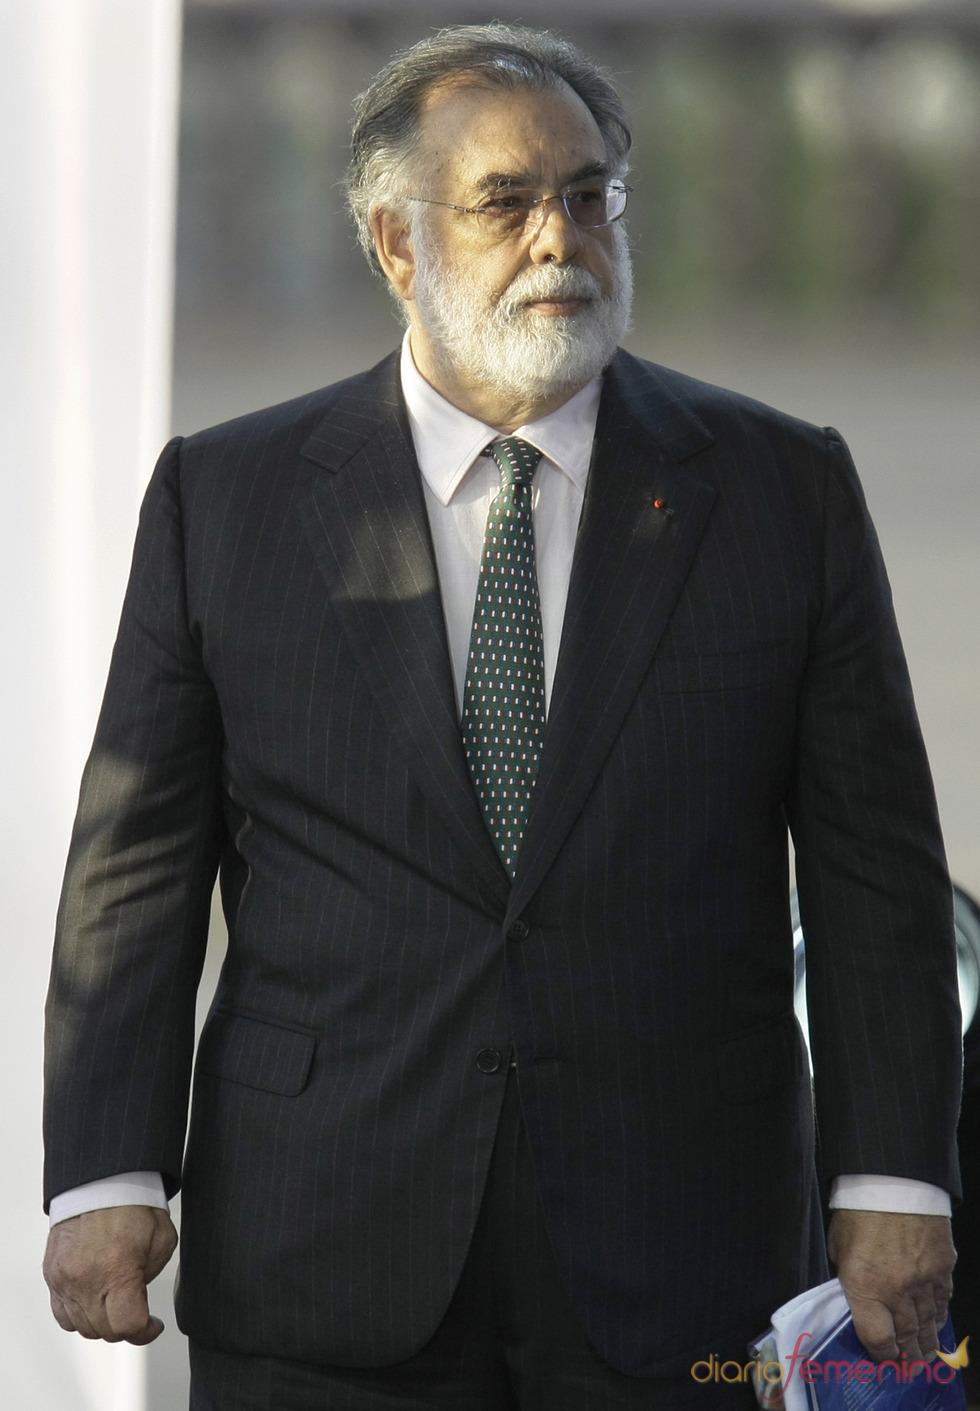 Francis Ford Coppola participa en una gala benéfica en Rusia